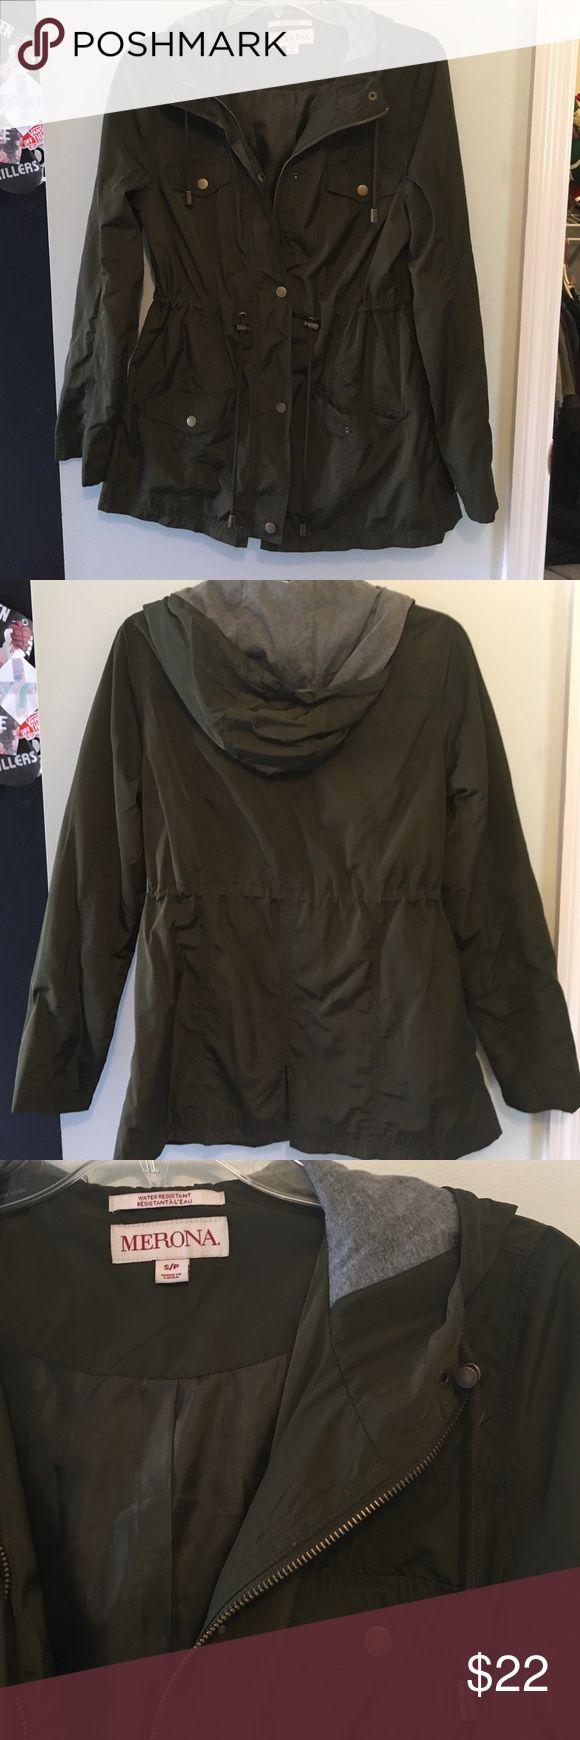 Army green Merona water resistant jacket Water resistant dark green jacket, perfect for rainy days! Barely been worn Merona Jackets & Coats Blazers